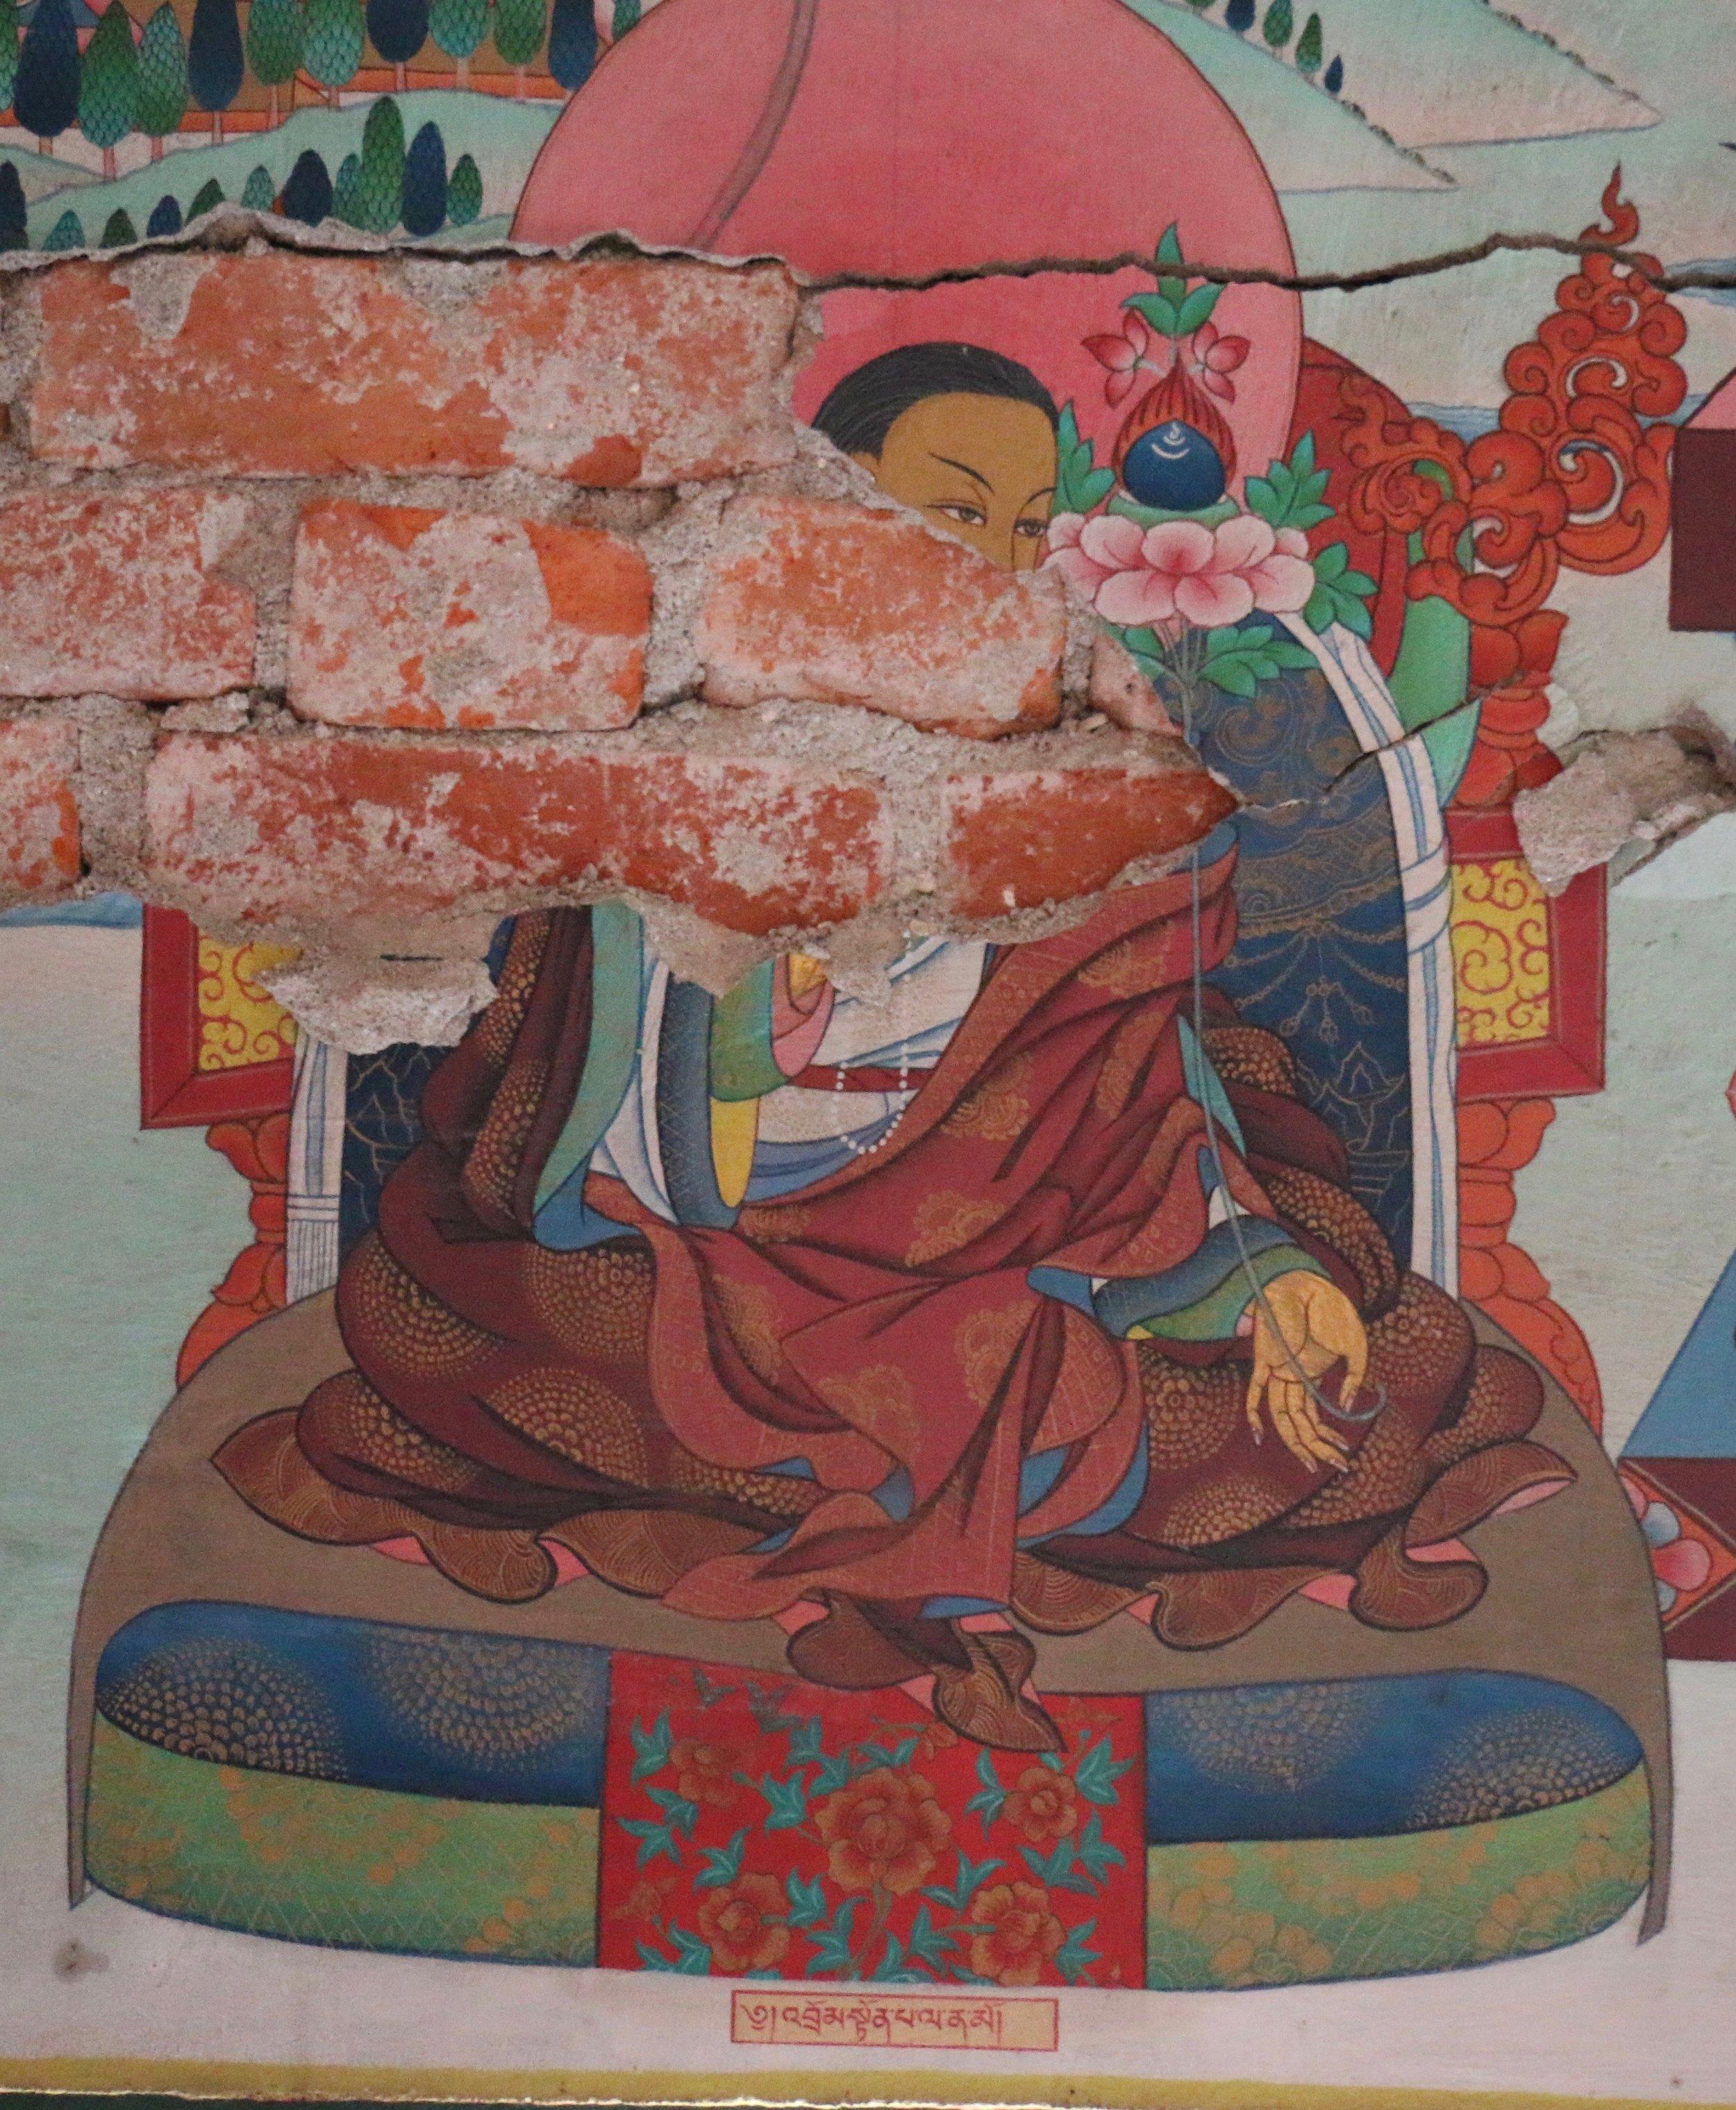 Dromtönpa (Atisha's main disciple)